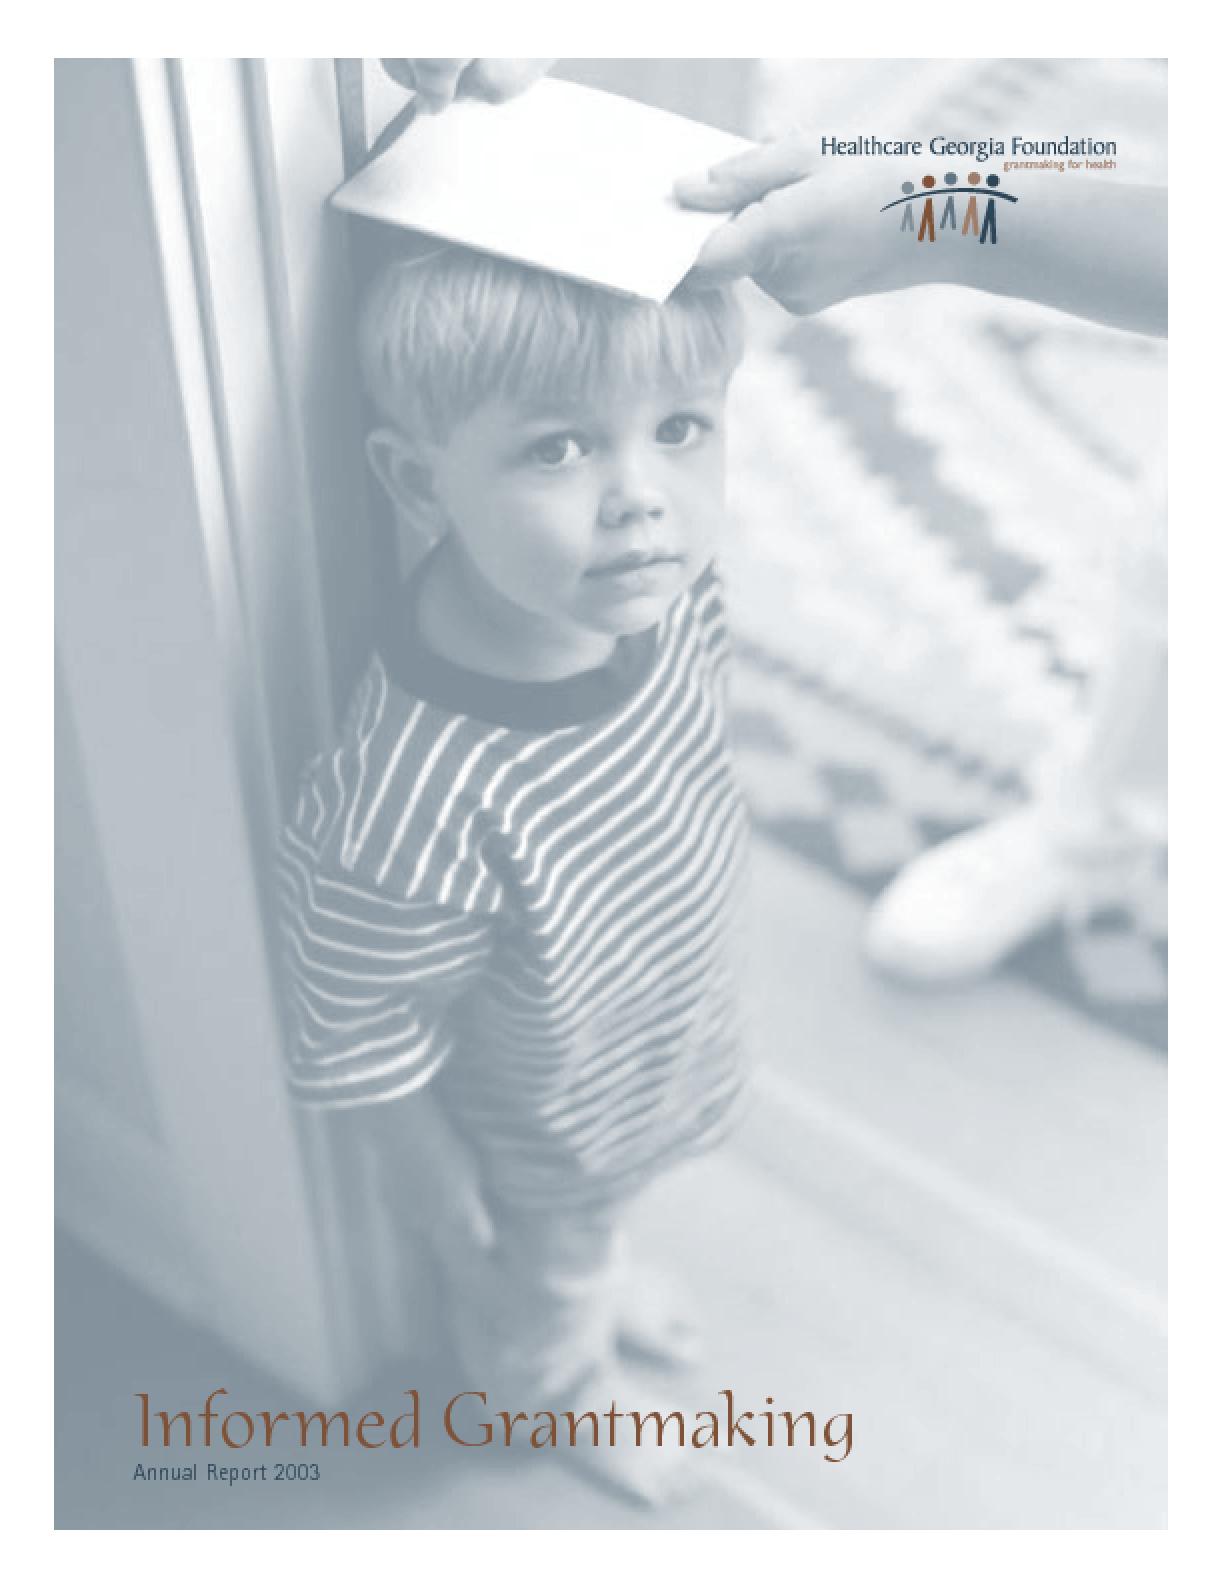 Healthcare Georgia Foundation - 2003 Annual Report: Informed Grantmaking